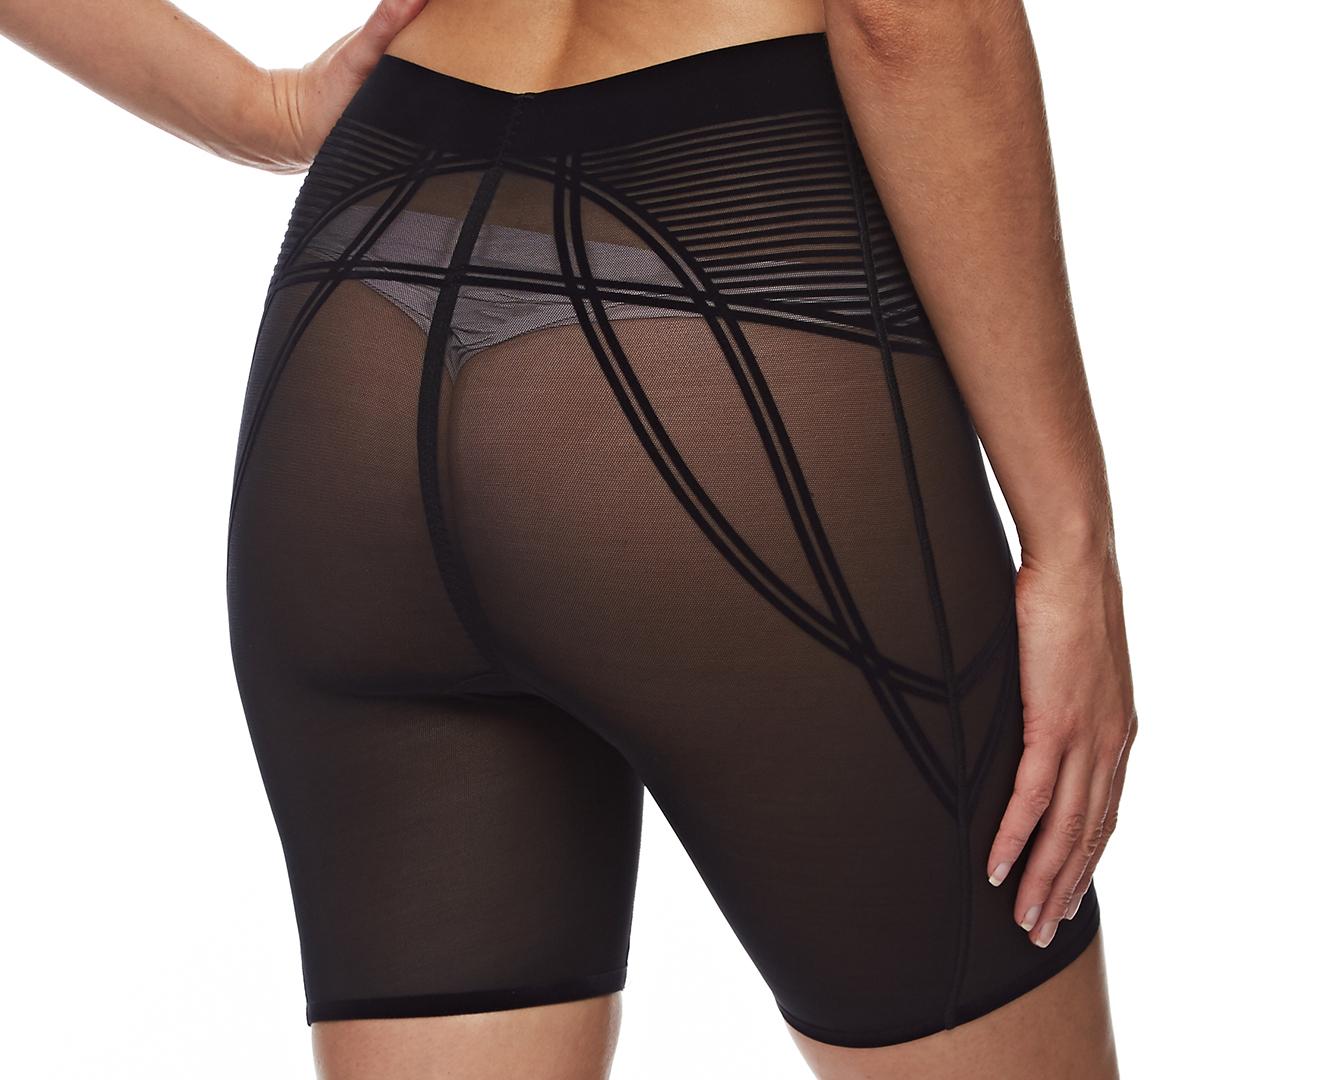 b1a52703470a8 Nancy Ganz Women s Sheer Decadence Shaper Short - Black